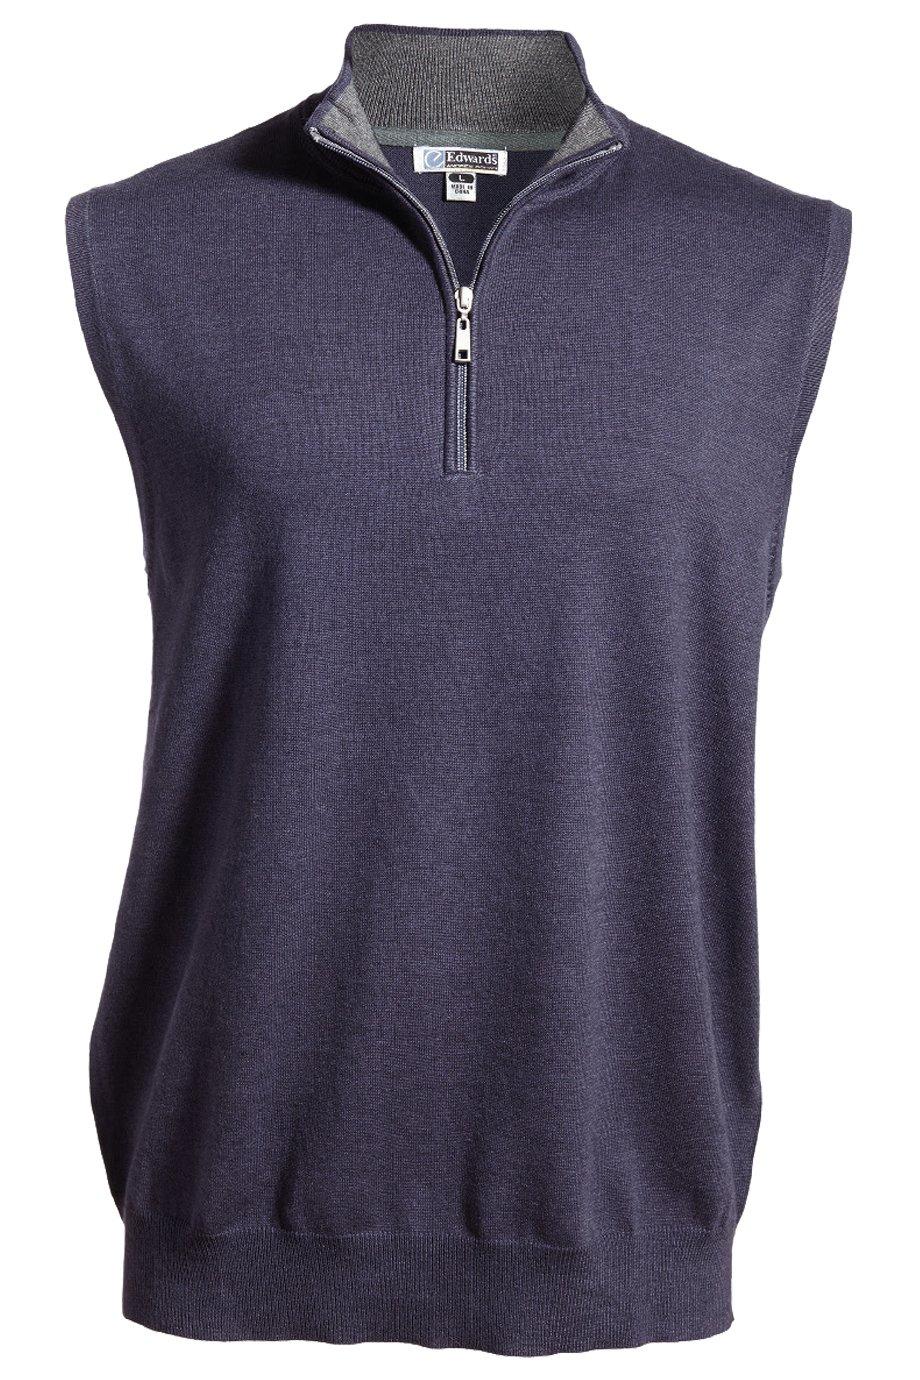 Edwards Garment Men's Lightweight Cotton Comfort Rib Knit Collar Vest